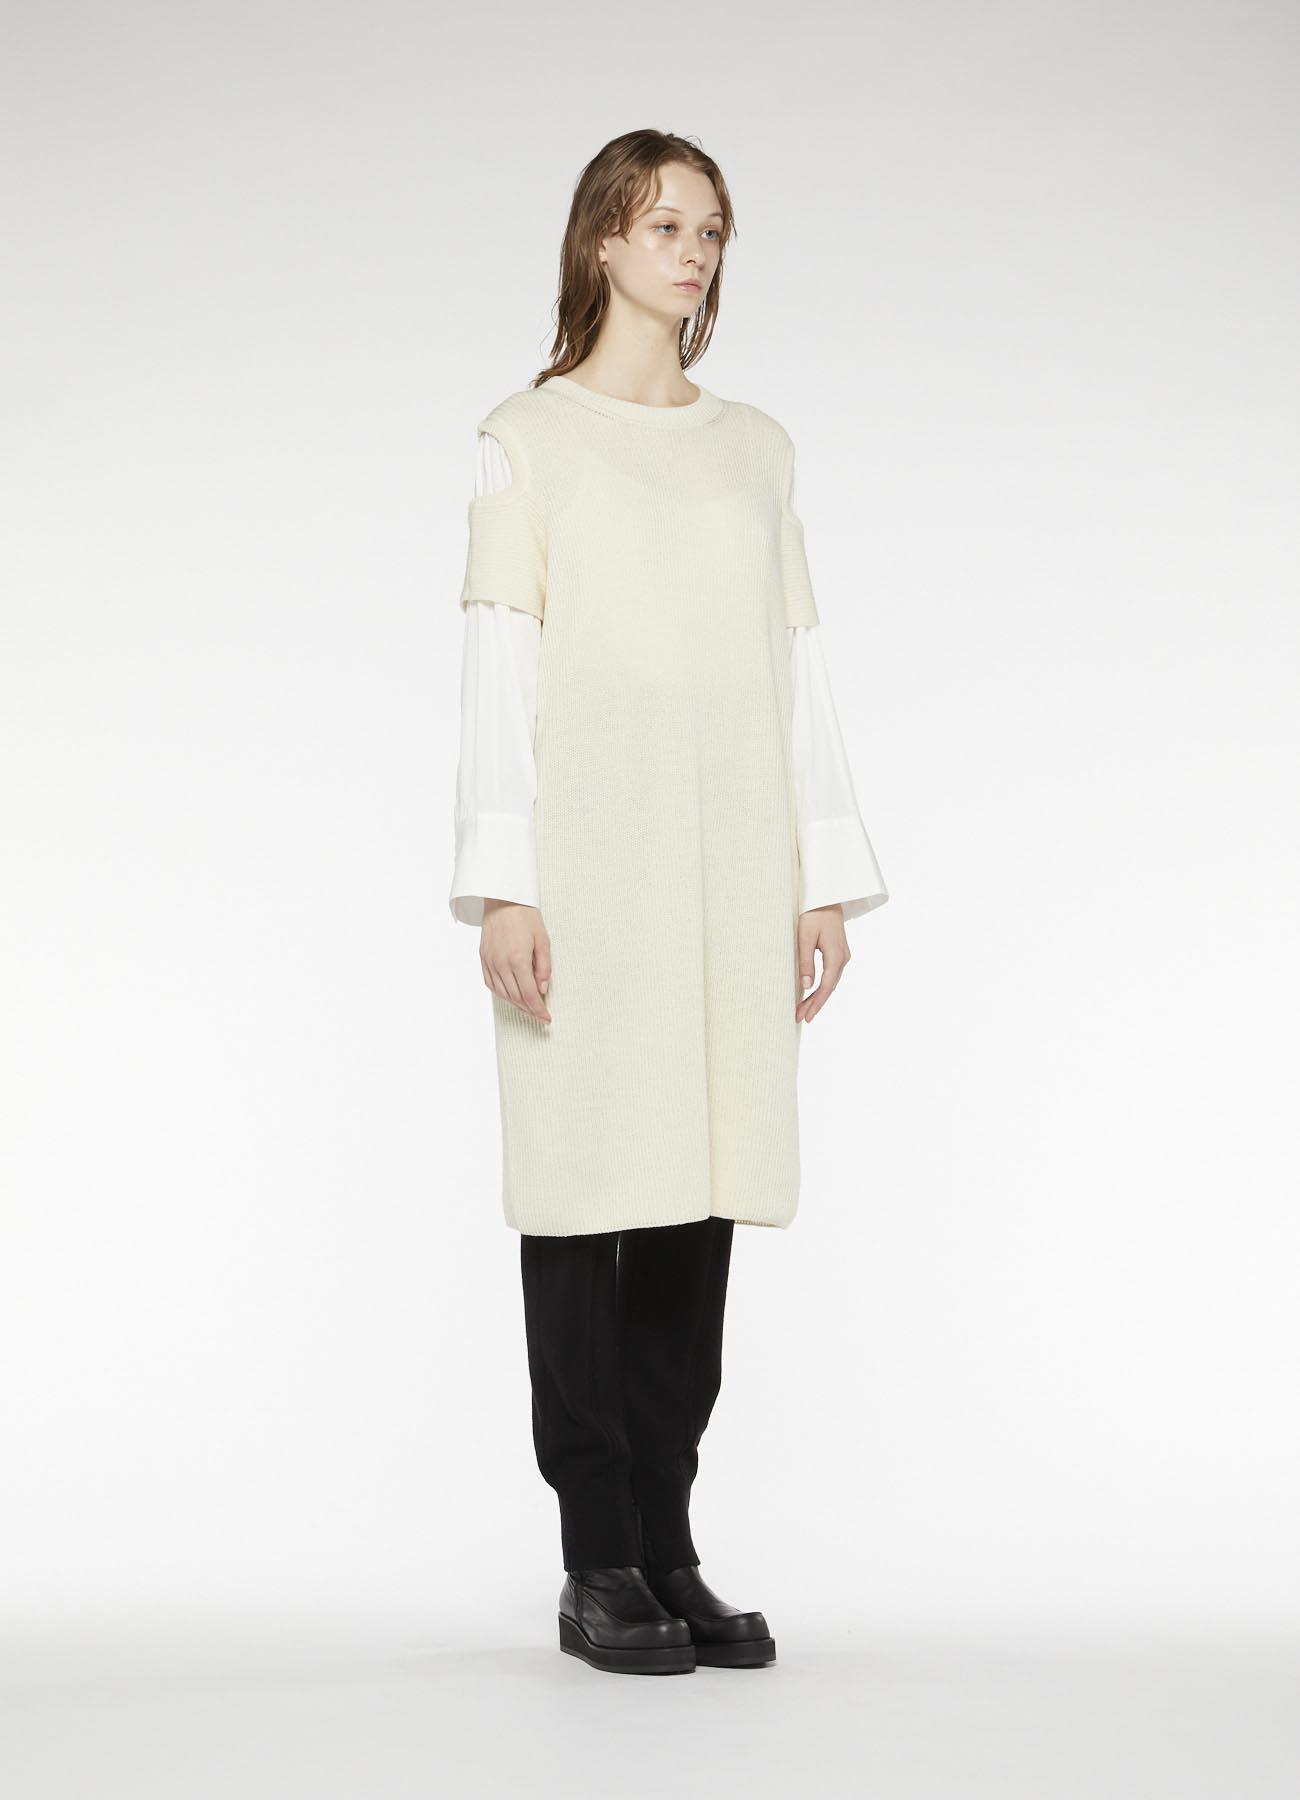 RISMATbyY's WOOL SHOULDER HOLE DRESS WITH SHIRT